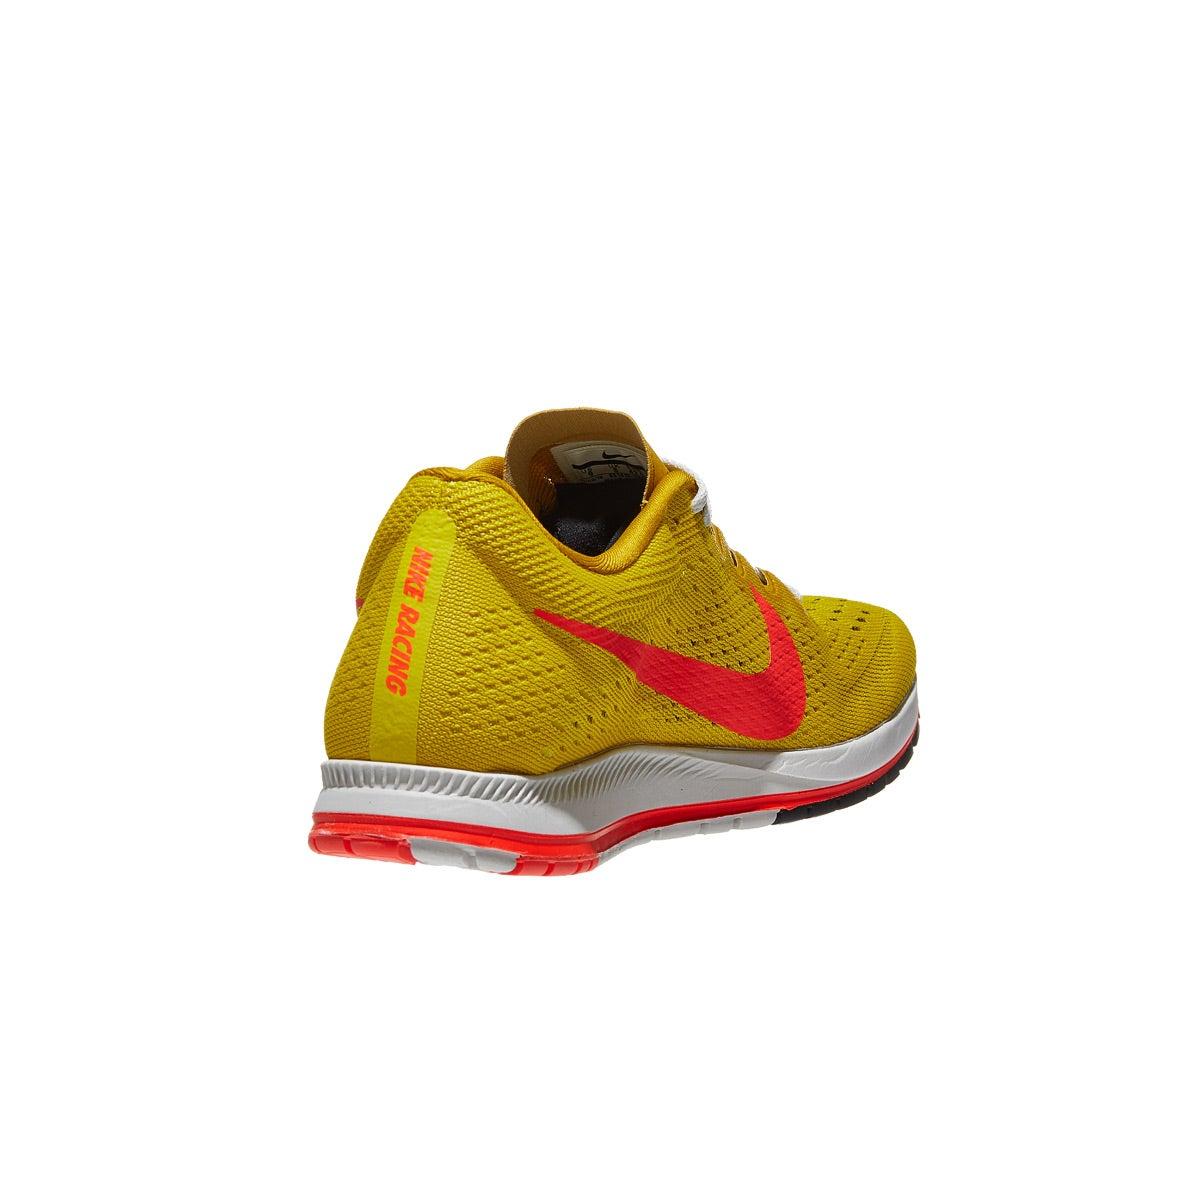 aee33ea900b7 Nike Zoom Streak 6 Unisex Shoes Bright Citron Crimson 360° View ...